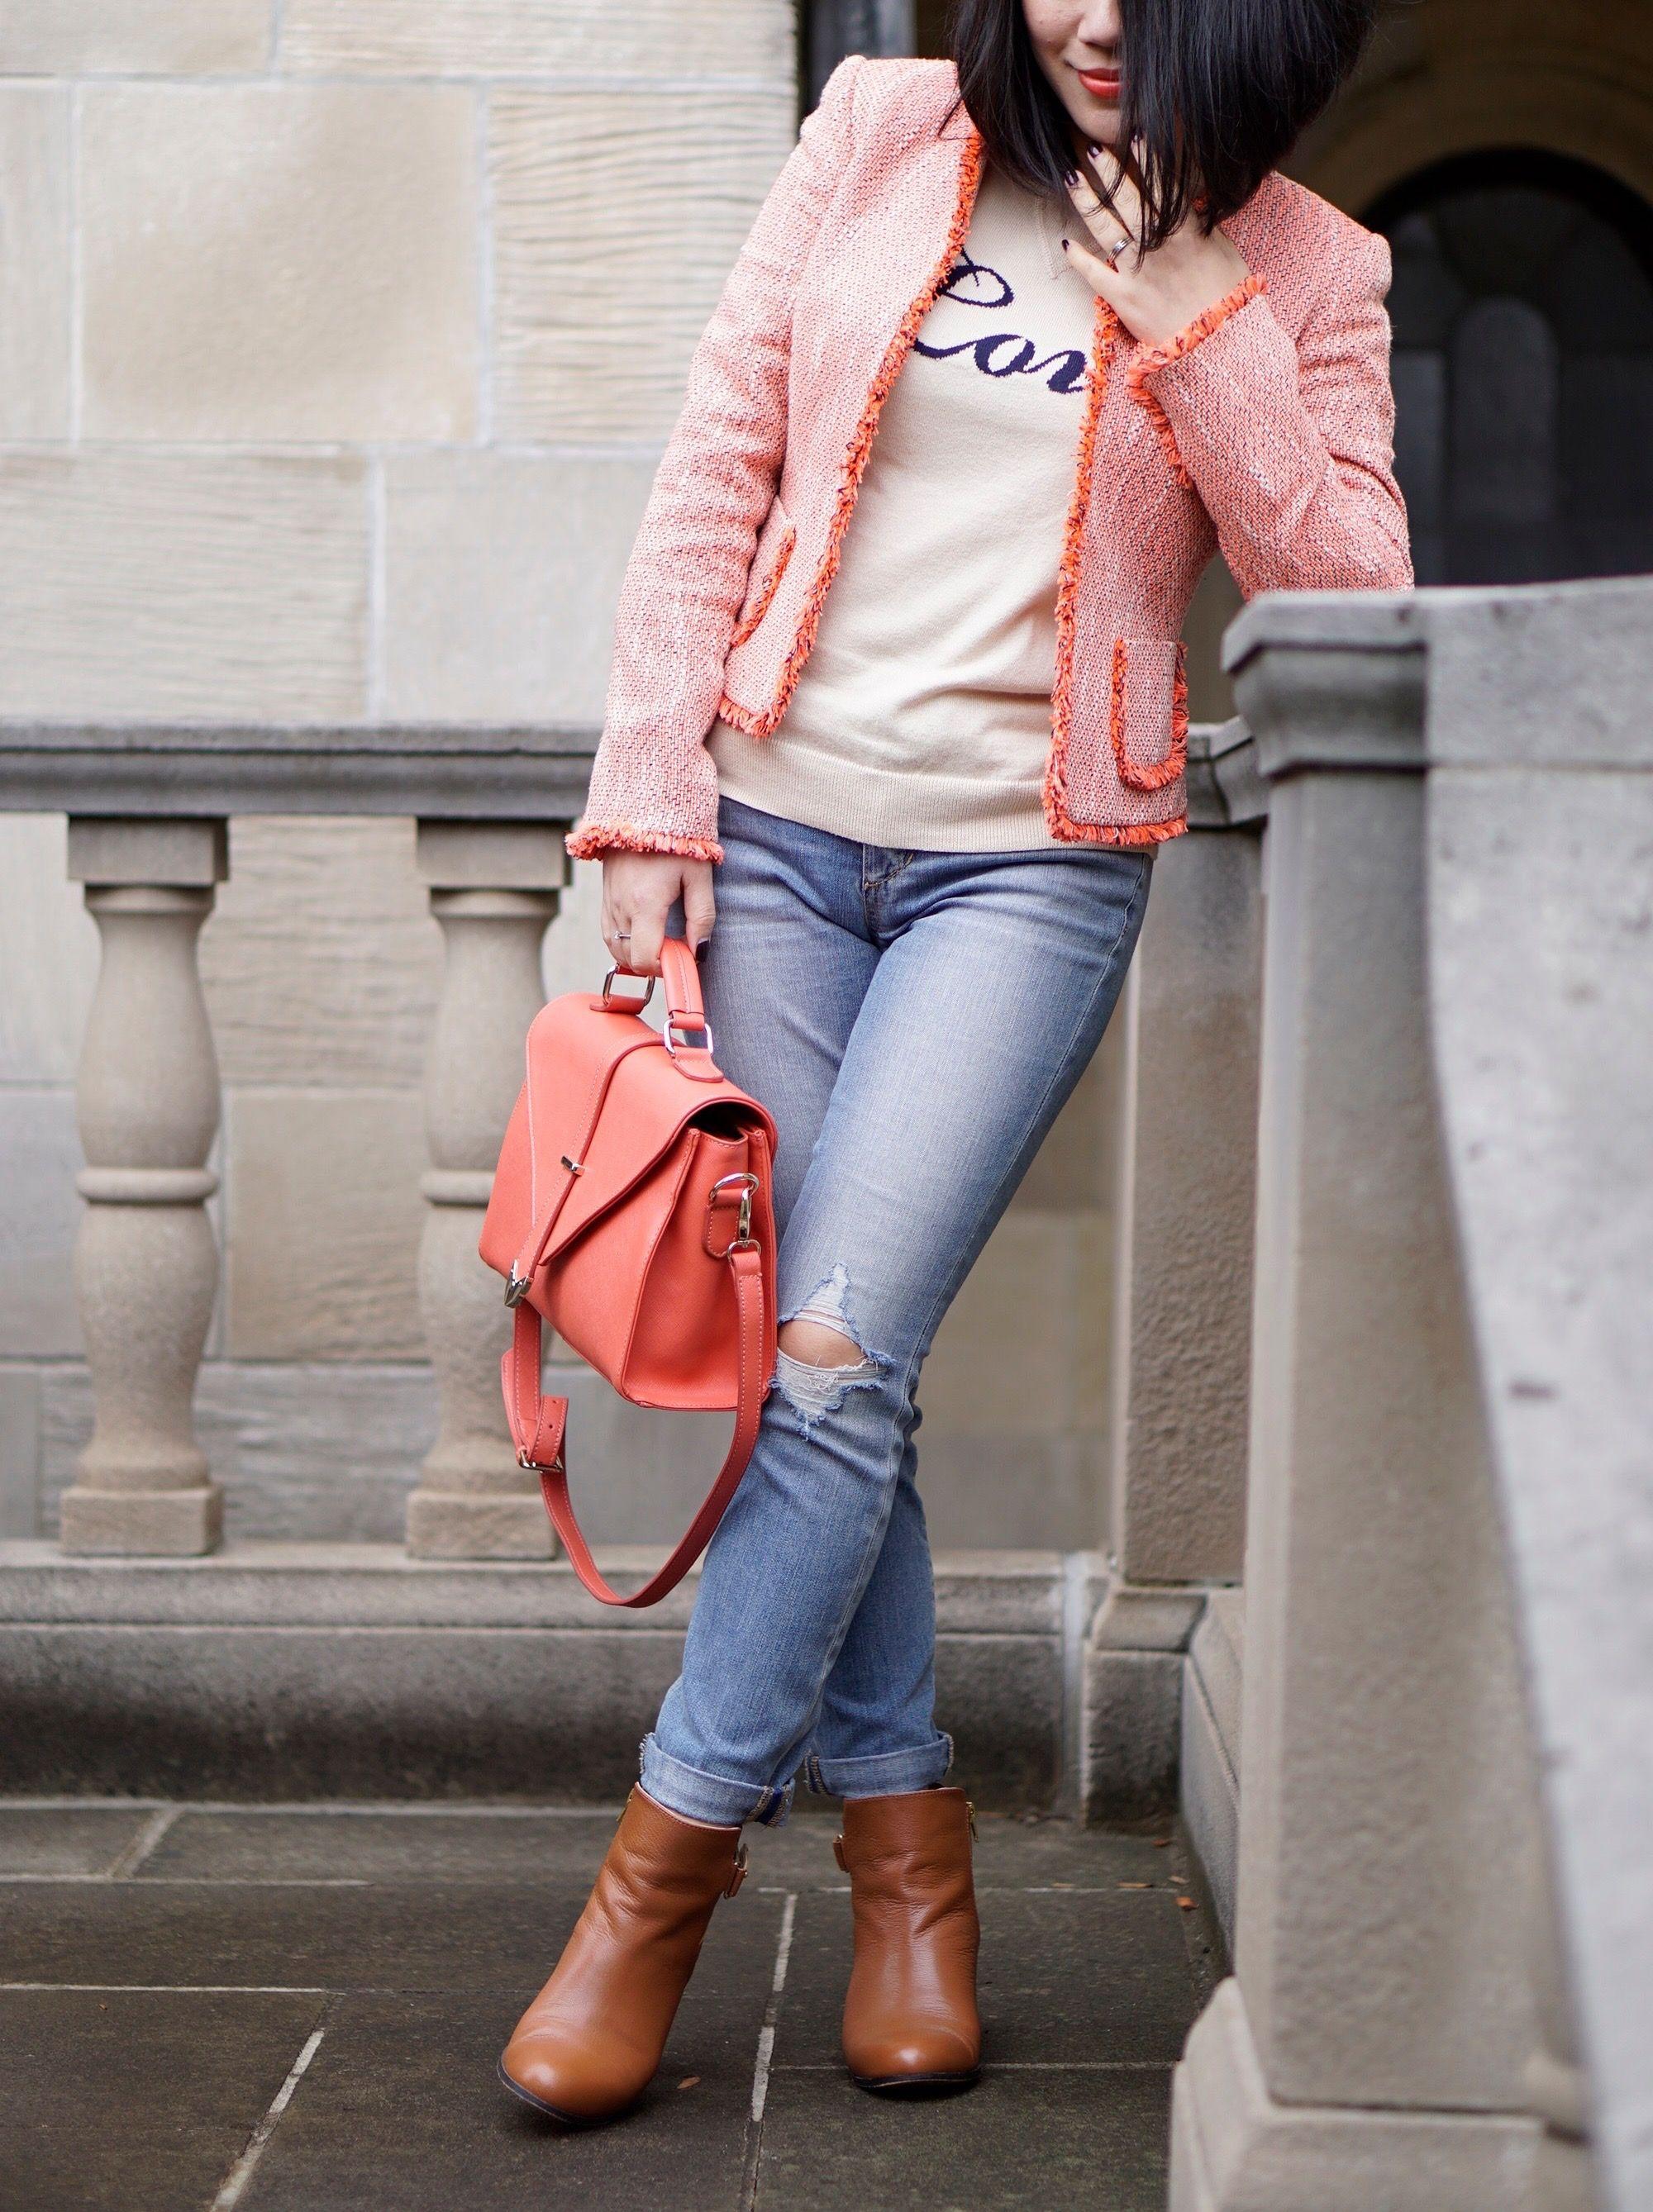 Petite street style Tahiti jacket+Loft love sweater+Joe's jeans+Nordstrom brown booties+ifchic bag